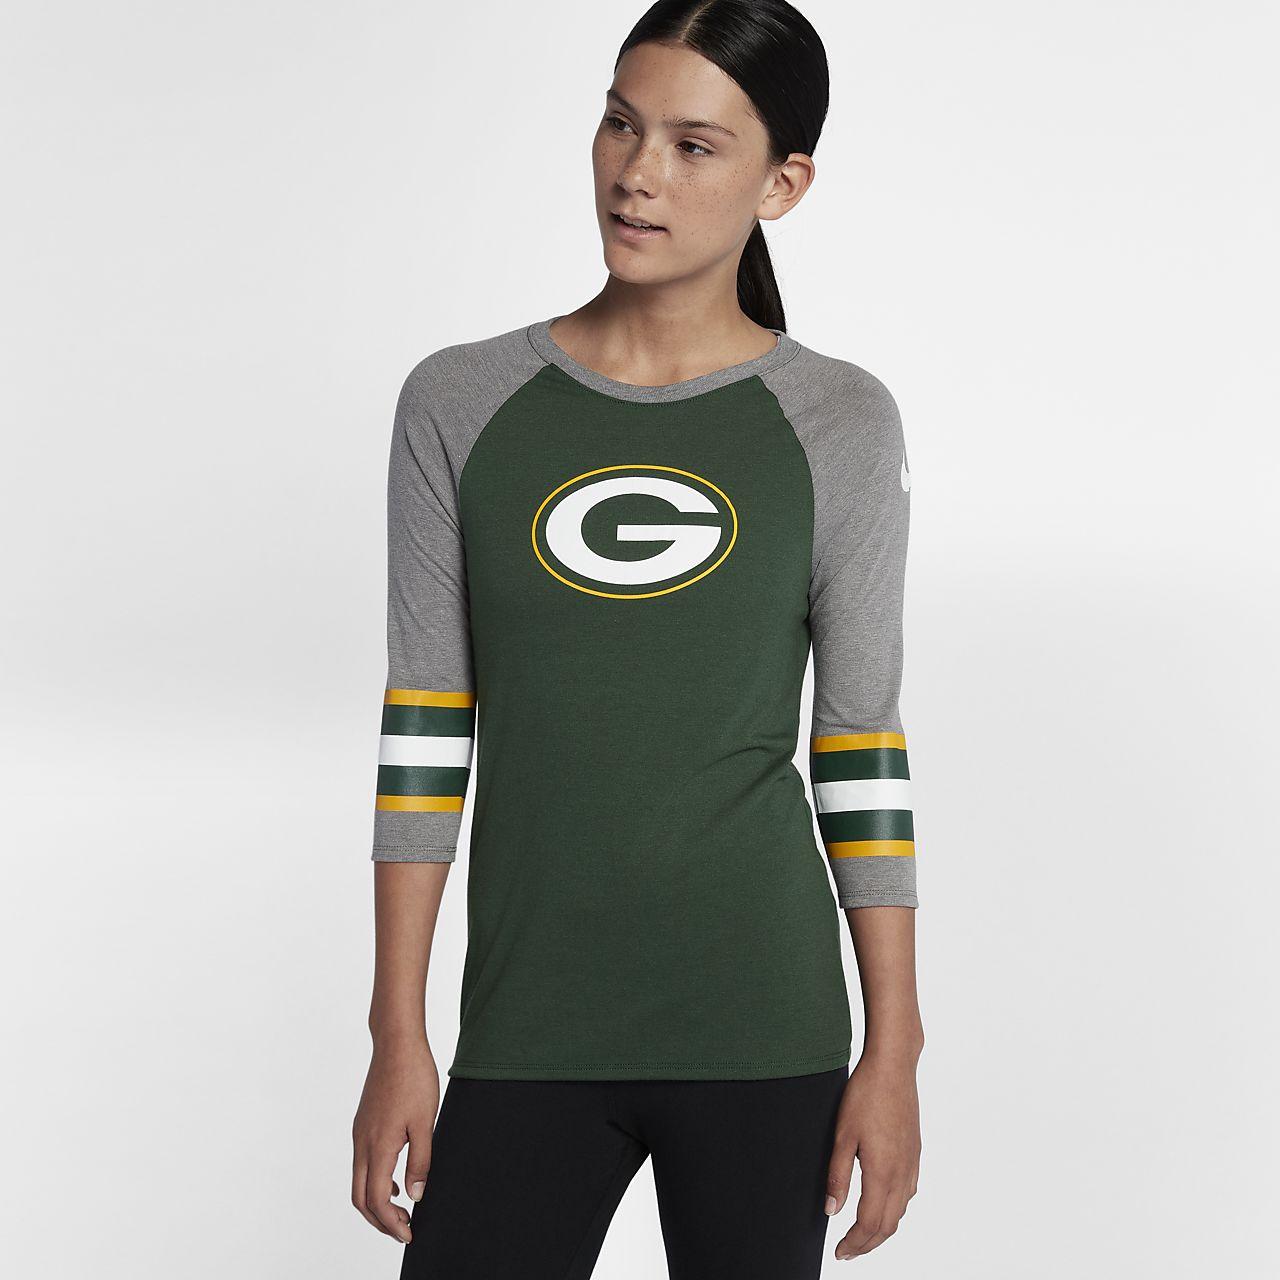 Nike Tri-Blend Raglan (NFL Packers)